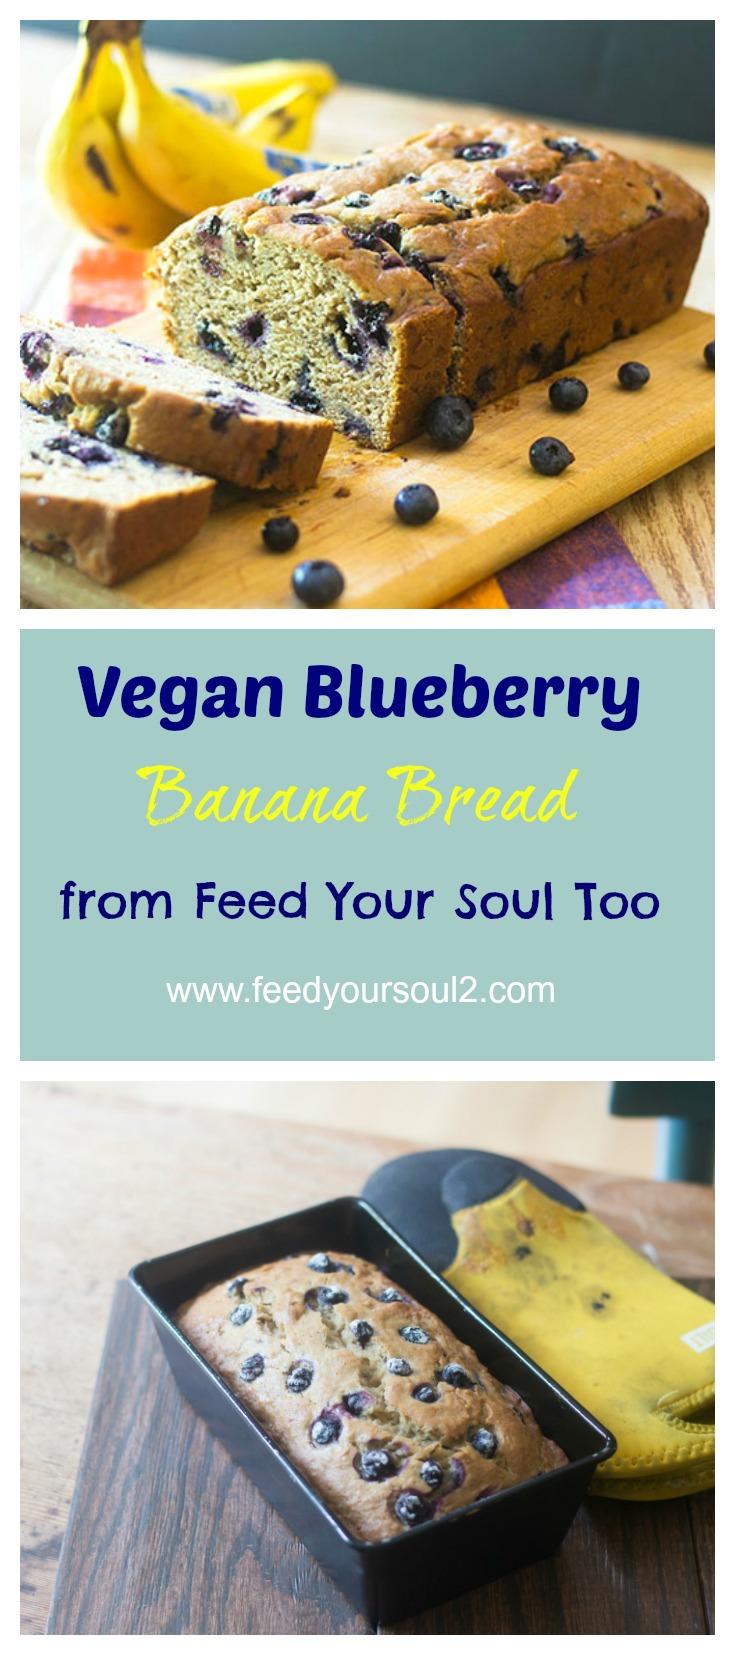 Vegan Blueberry Banana Bread #dessert #bananas #vegan | feedyoursoul2.com